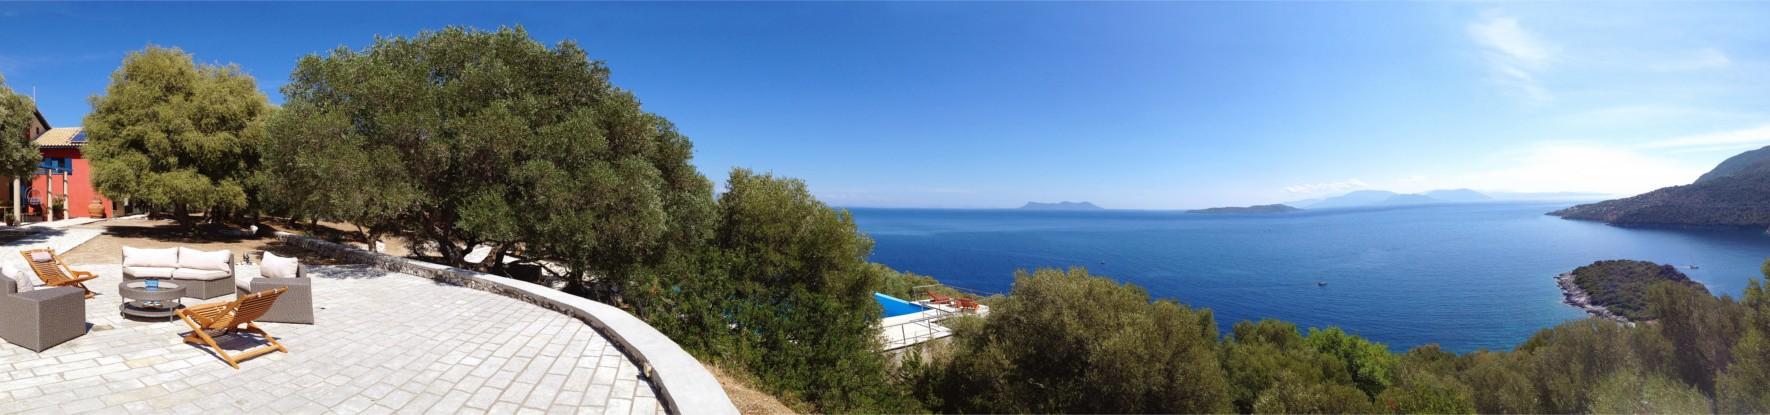 Villa panoramic view